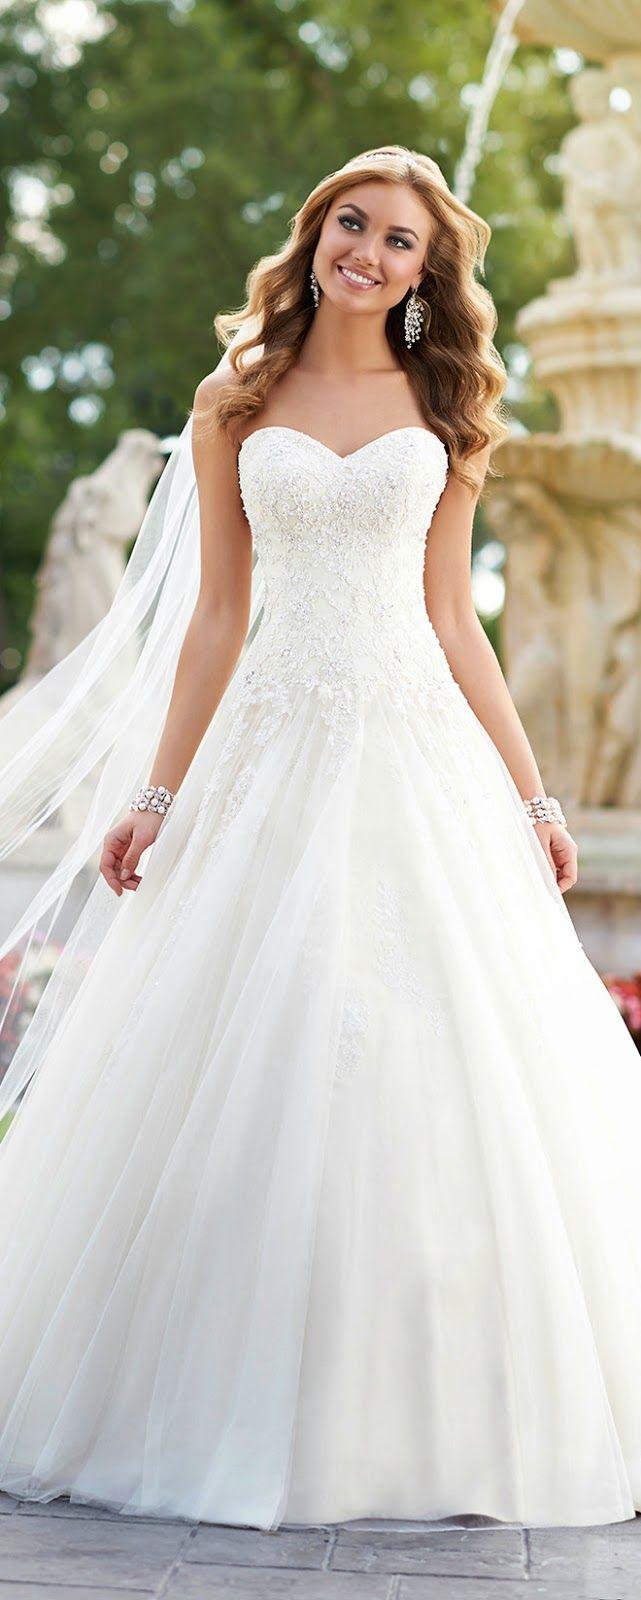 Tendenze abiti da sposa 2017